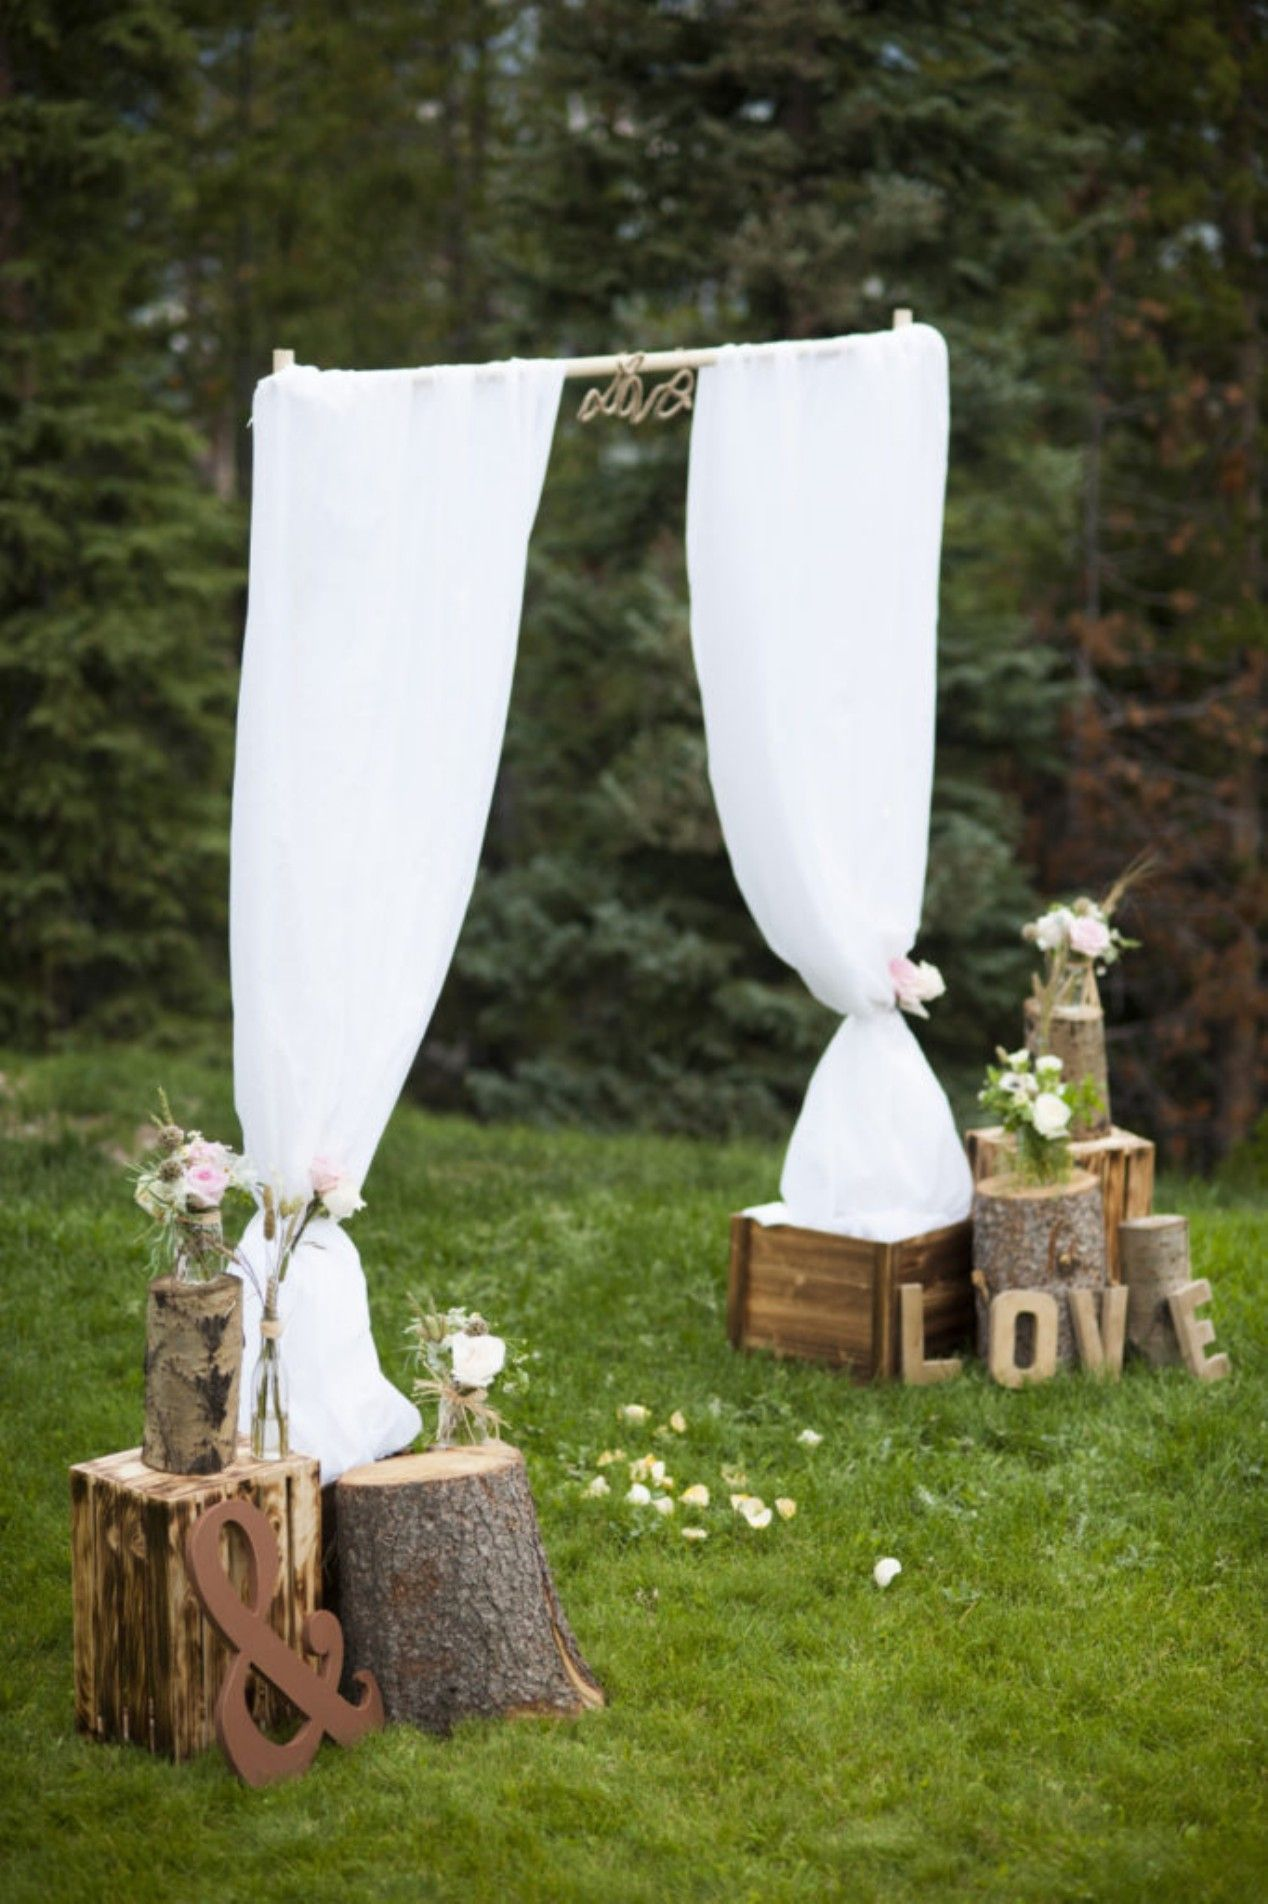 33 great outdoor wedding decoration ideas weddings wedding and 33 great outdoor wedding decoration ideas junglespirit Images